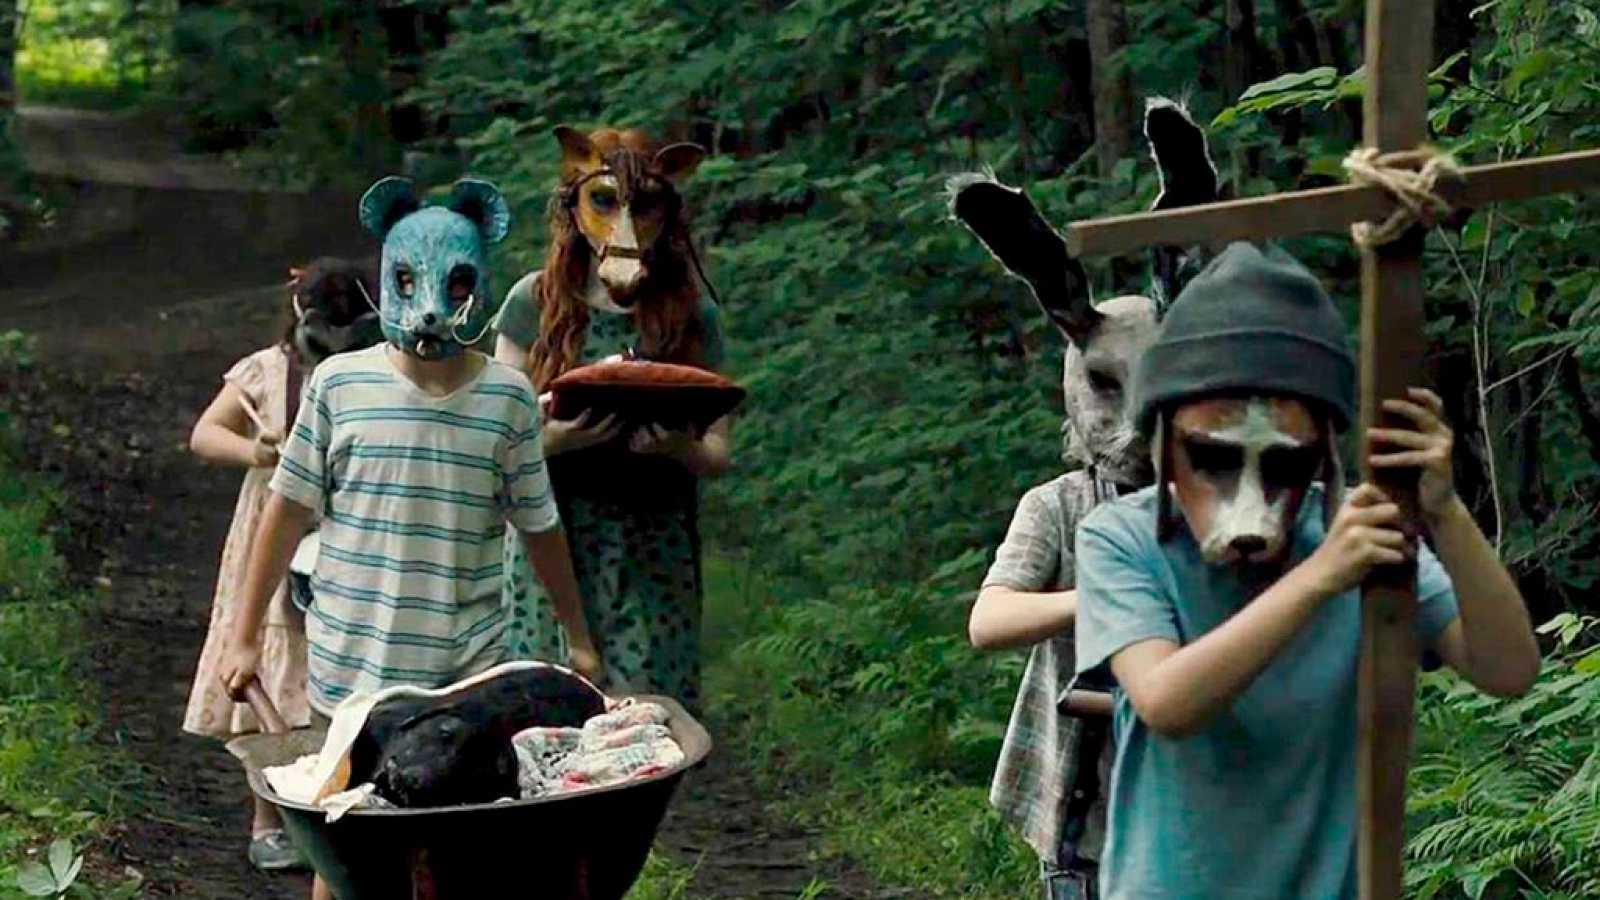 'Cementerio de animales'